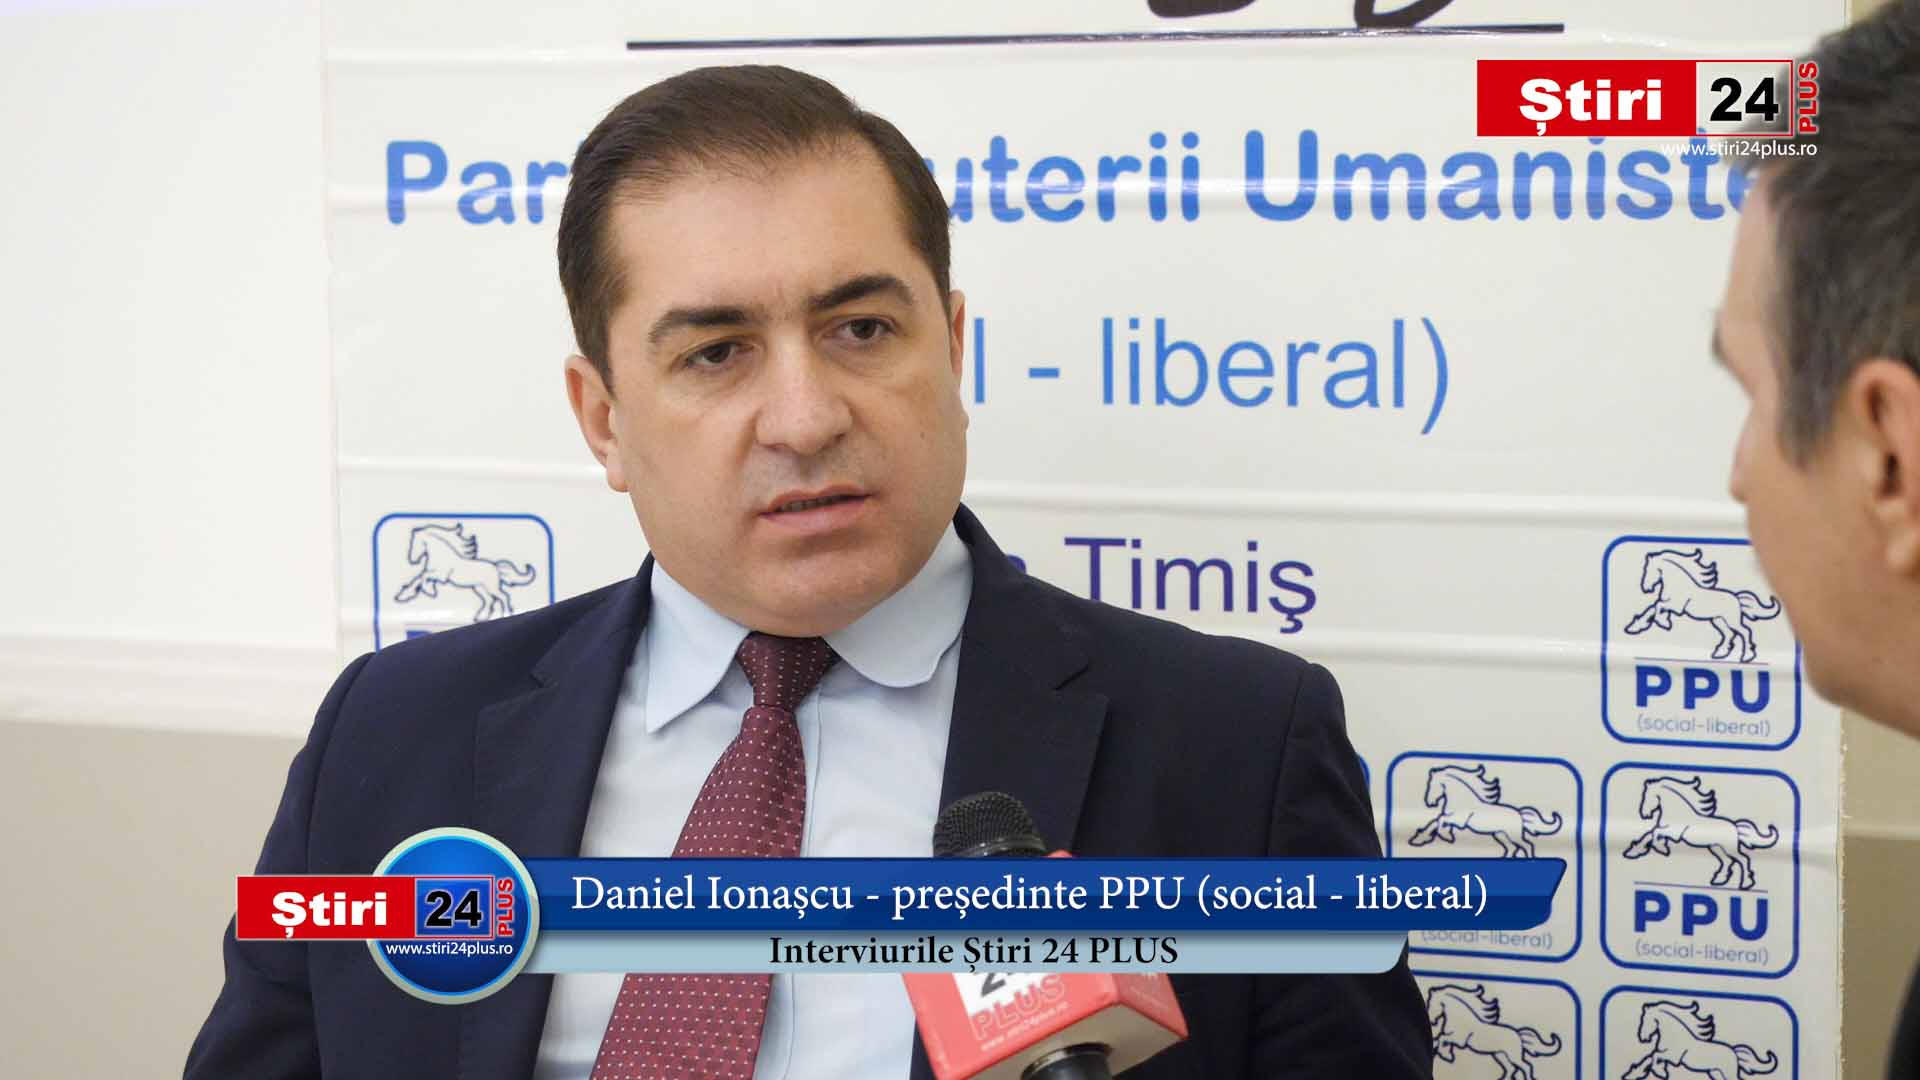 Interviu cu avocatul Daniel Ionașcu președintele PPU-sl